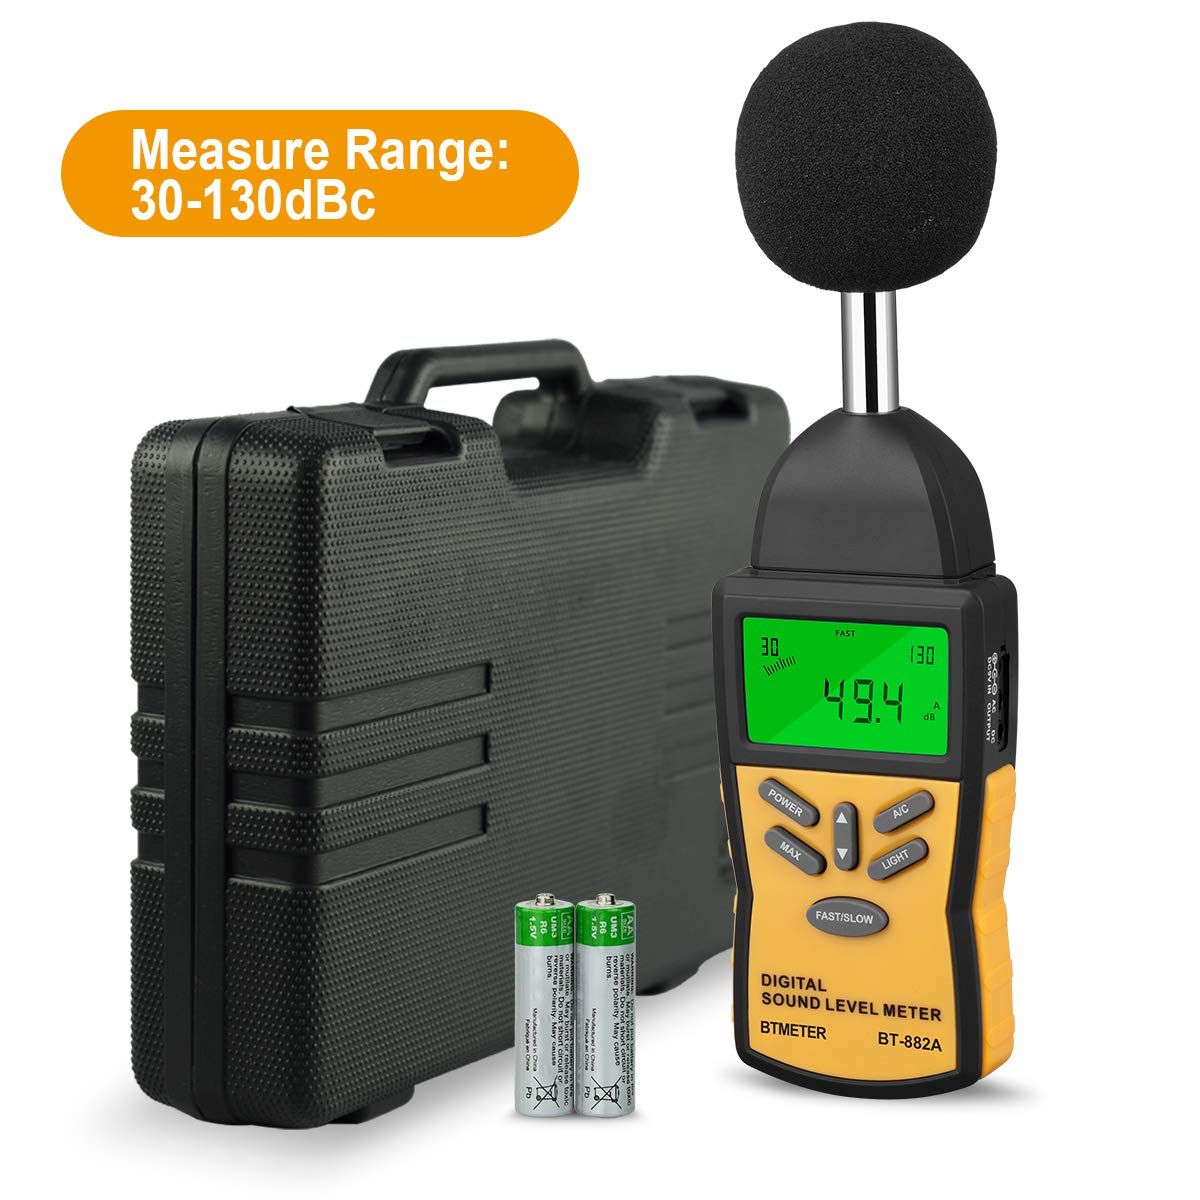 Decibel Meter- BTMETER BT-882A Digital Sound Level Meter Sound Pressure Level Reader(SPL) with 30-130dB Range for Noise Measurement by BTMETER